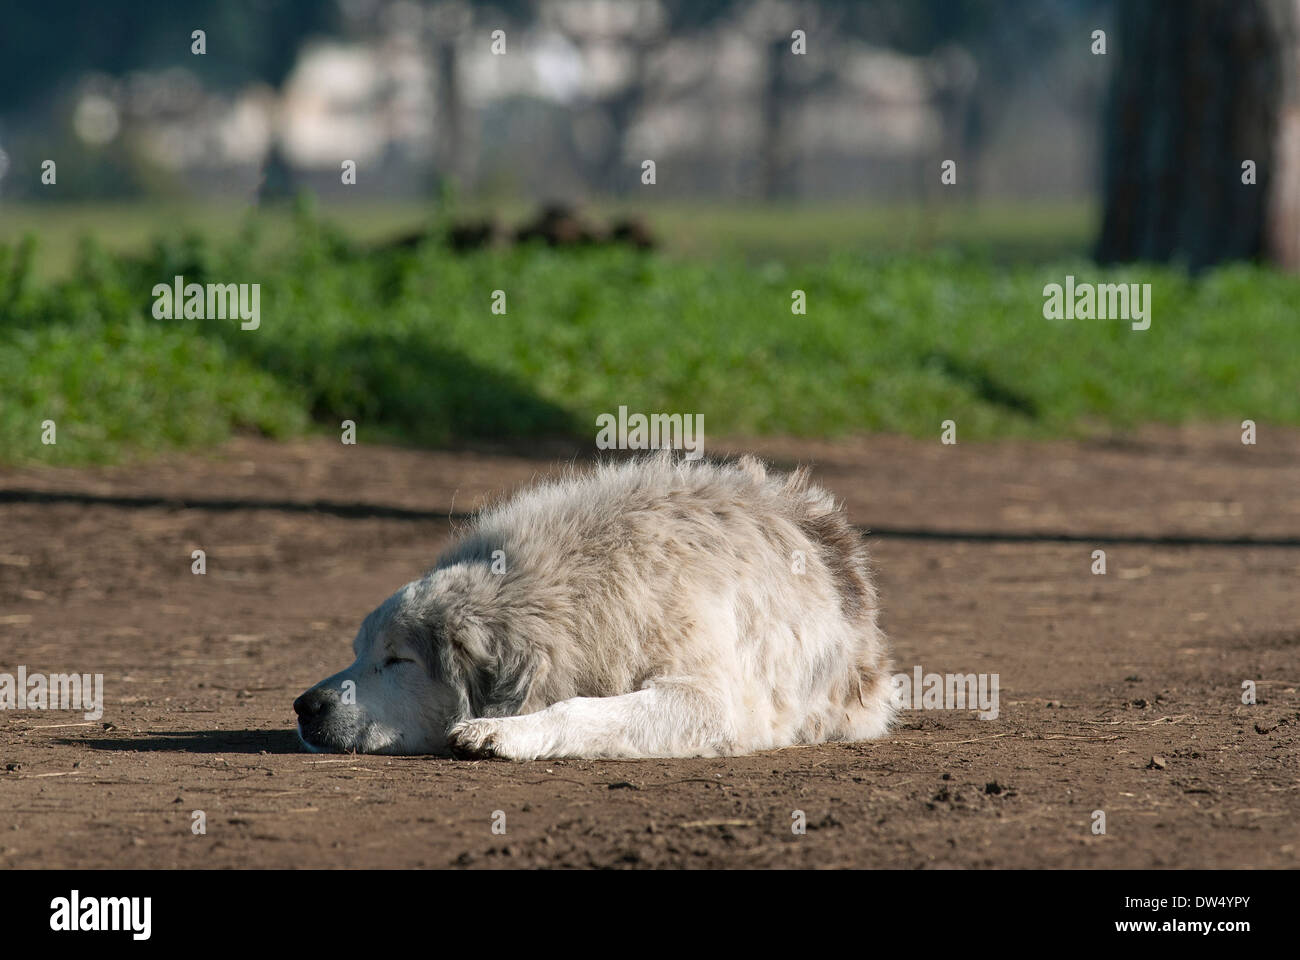 Sheepdog sleeping on dirt road, Appia Antica Regional Park, Rome, Lazio, Italy - Stock Image